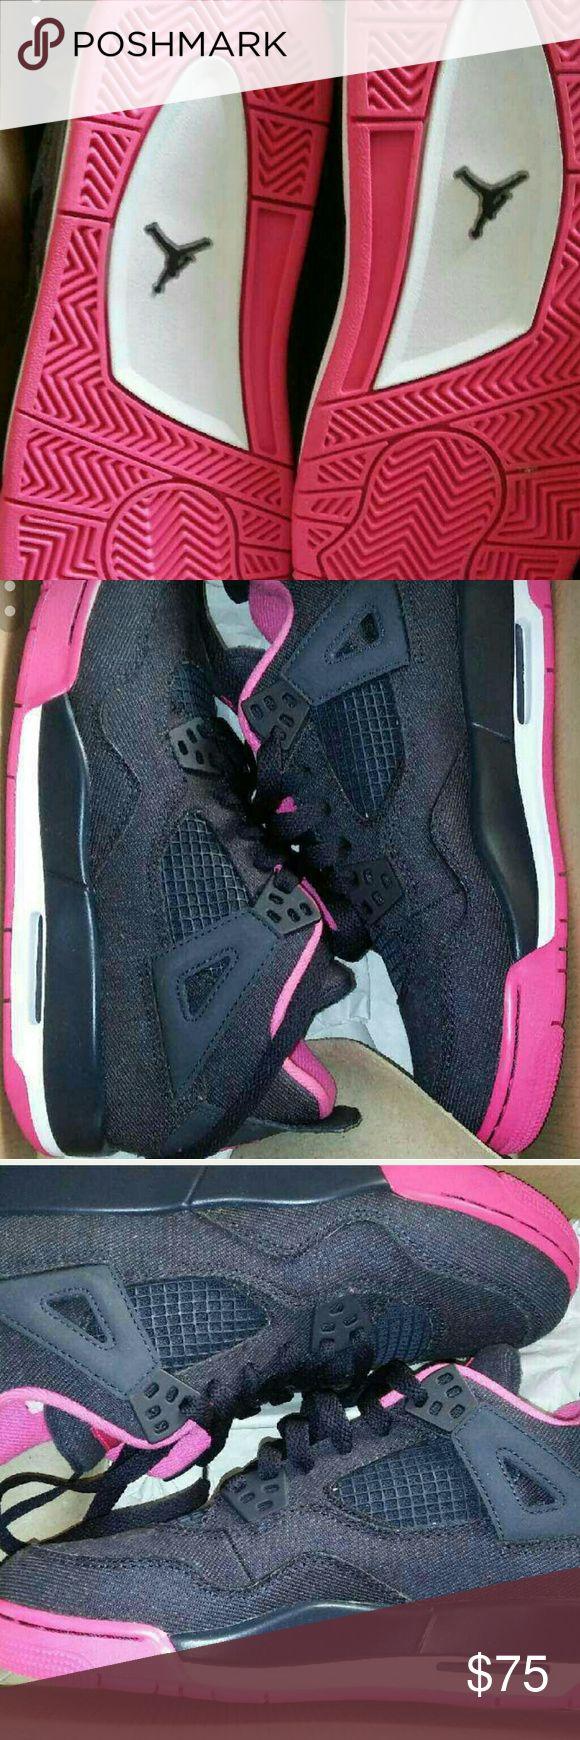 Jumpman Jordan Retro GG Size 4.5 Jumpman Jordans Shoes Sneakers